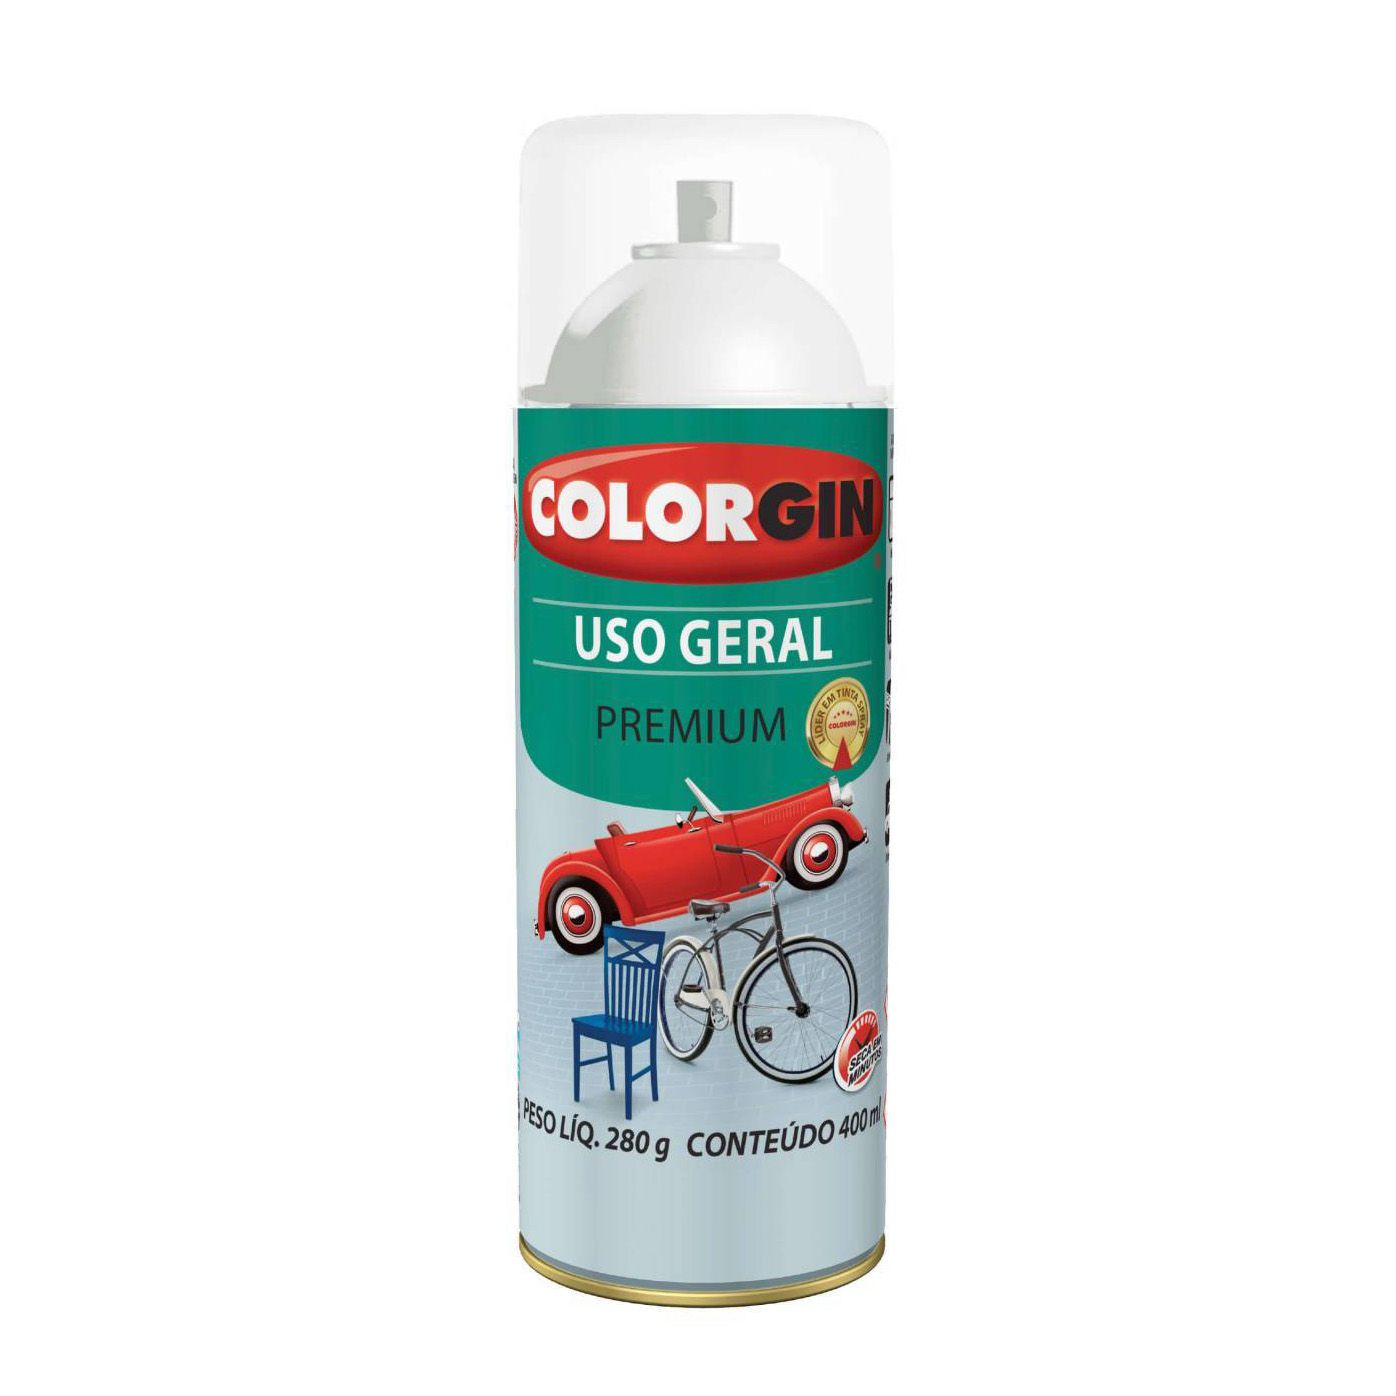 Spray Colorgin Uso Geral Verniz Incolor Brilhante 57051